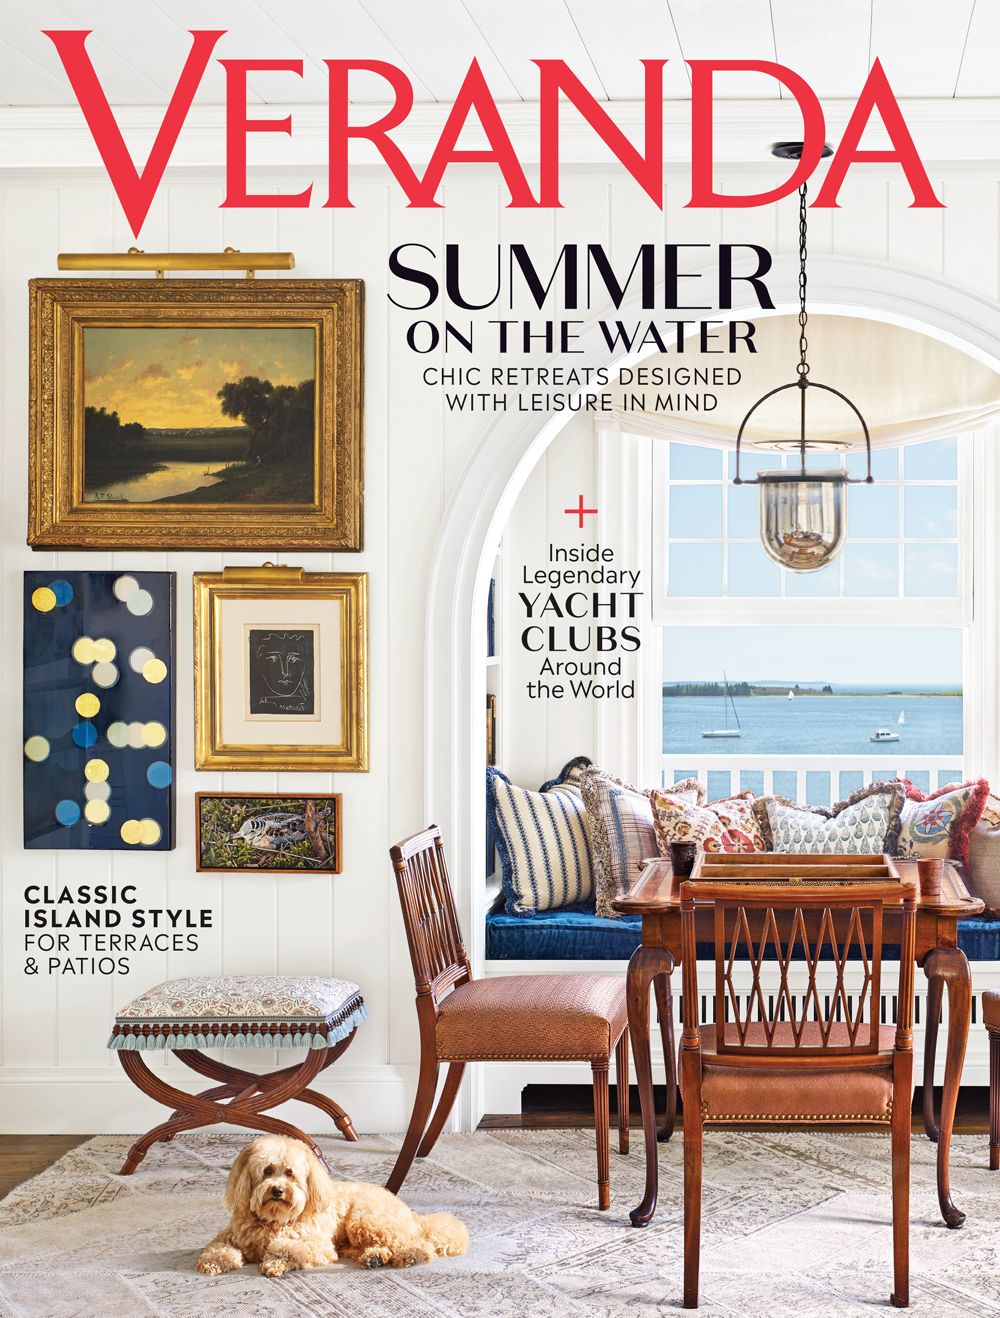 Veranda-Magazine-Cover.png